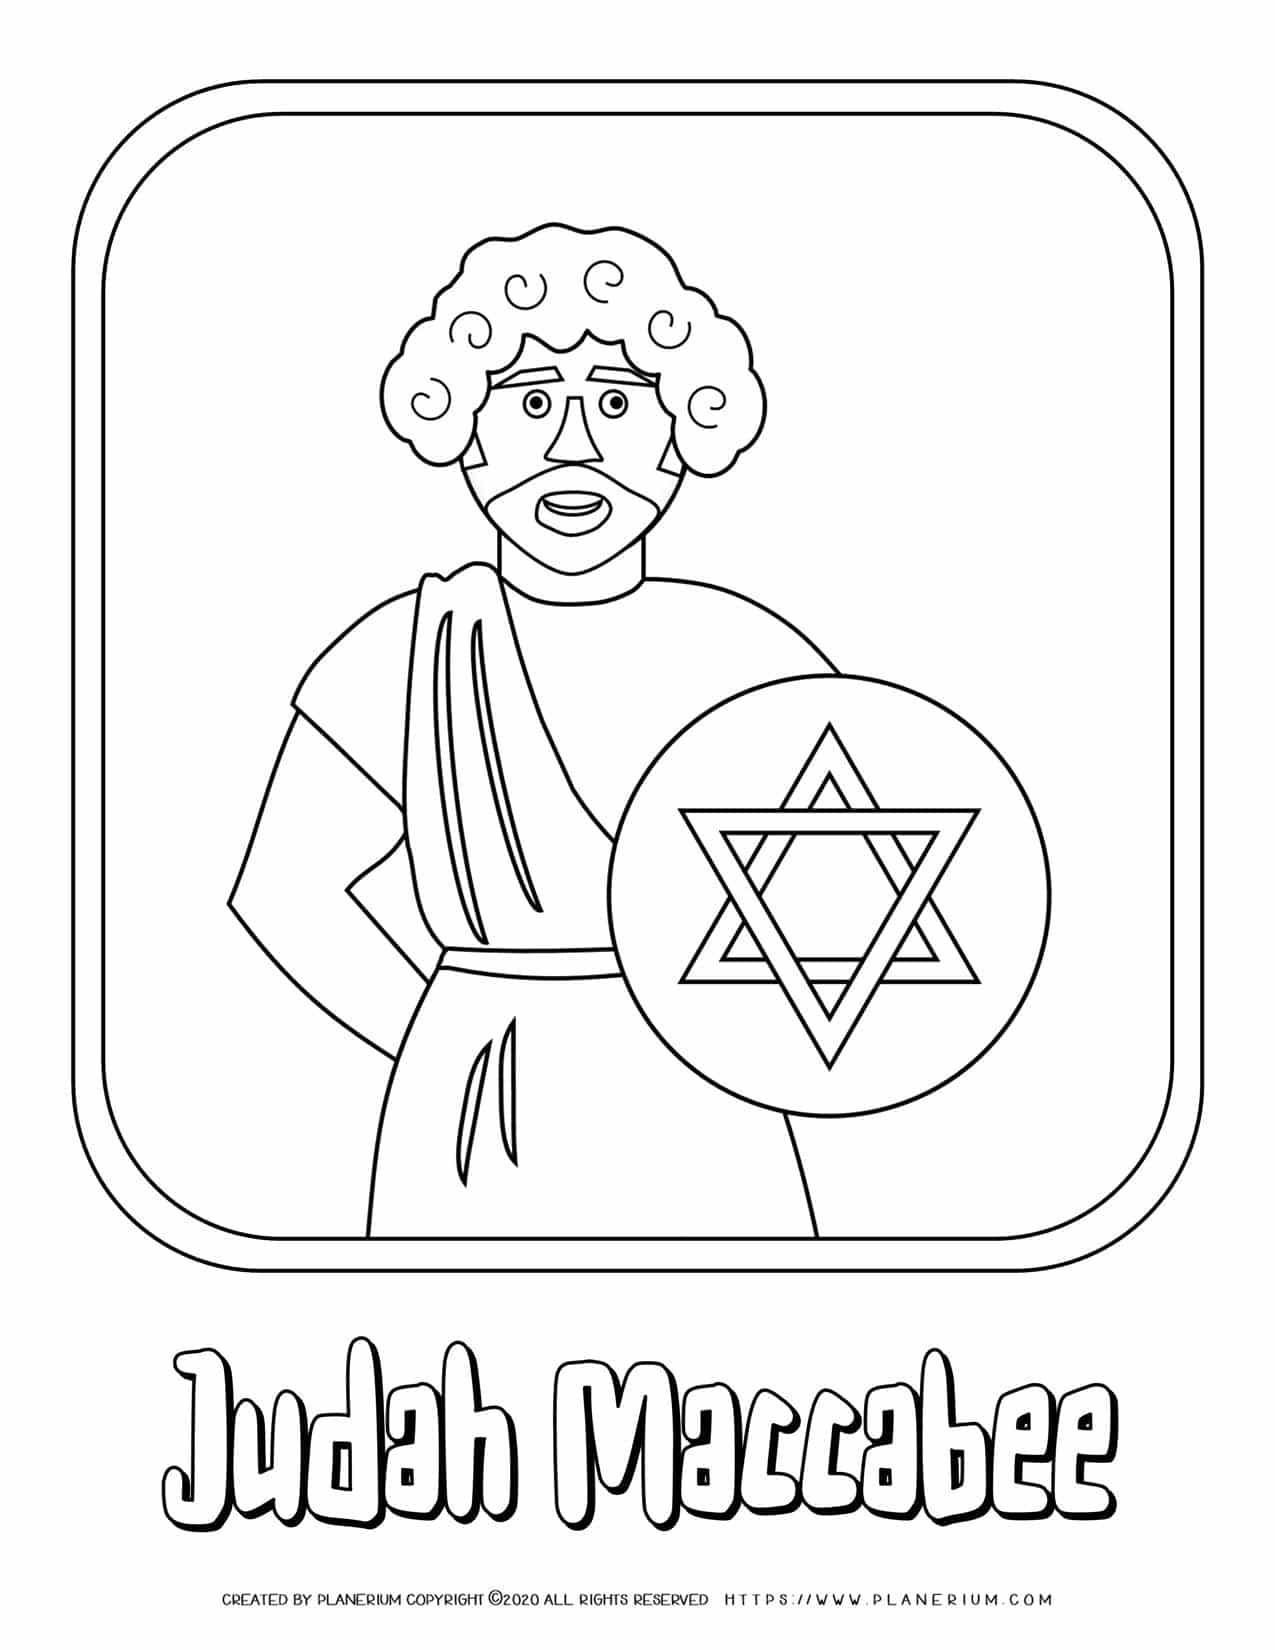 Hanukkah Coloring Pages - Judah Maccabee - Free Printable | Planerium